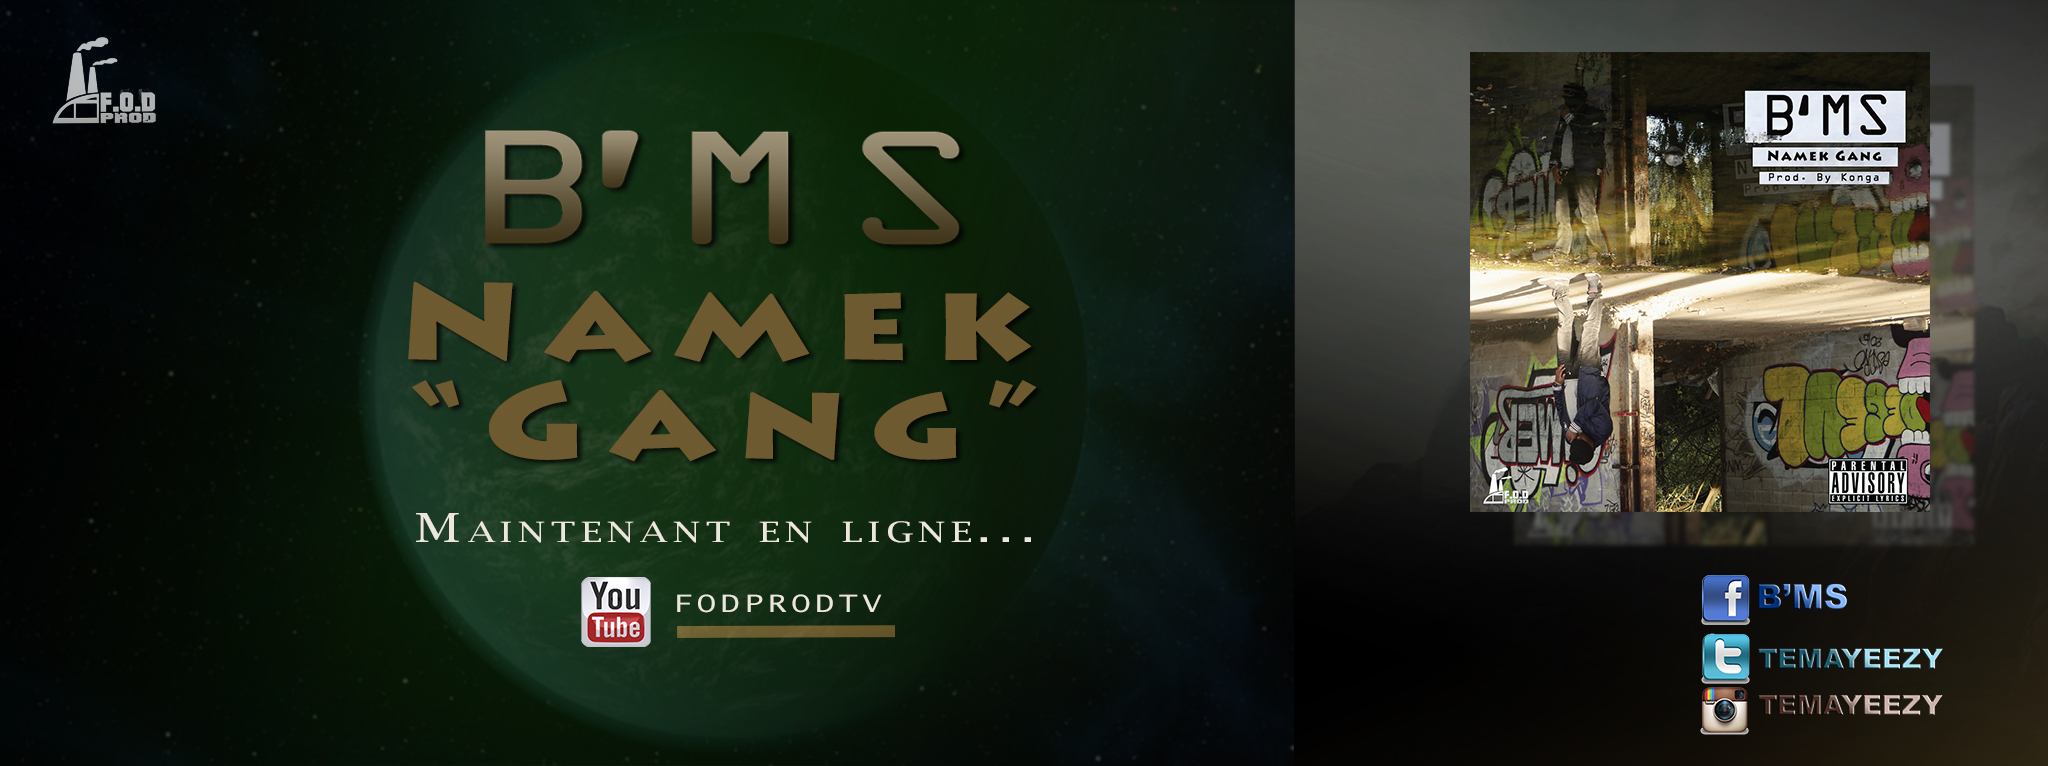 B'Ms – Namek Gang Banniere Clip